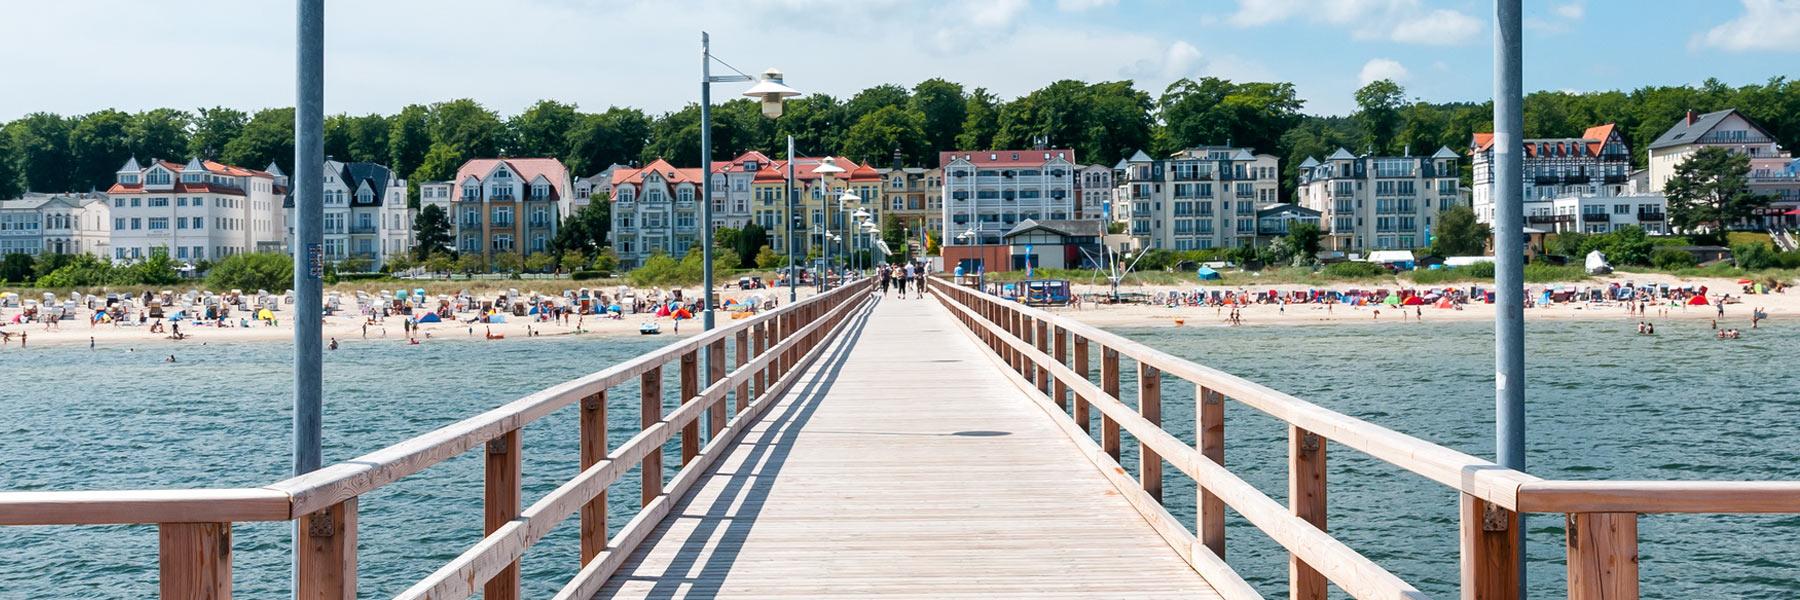 Seebrücke - Seeheilbad Bansin